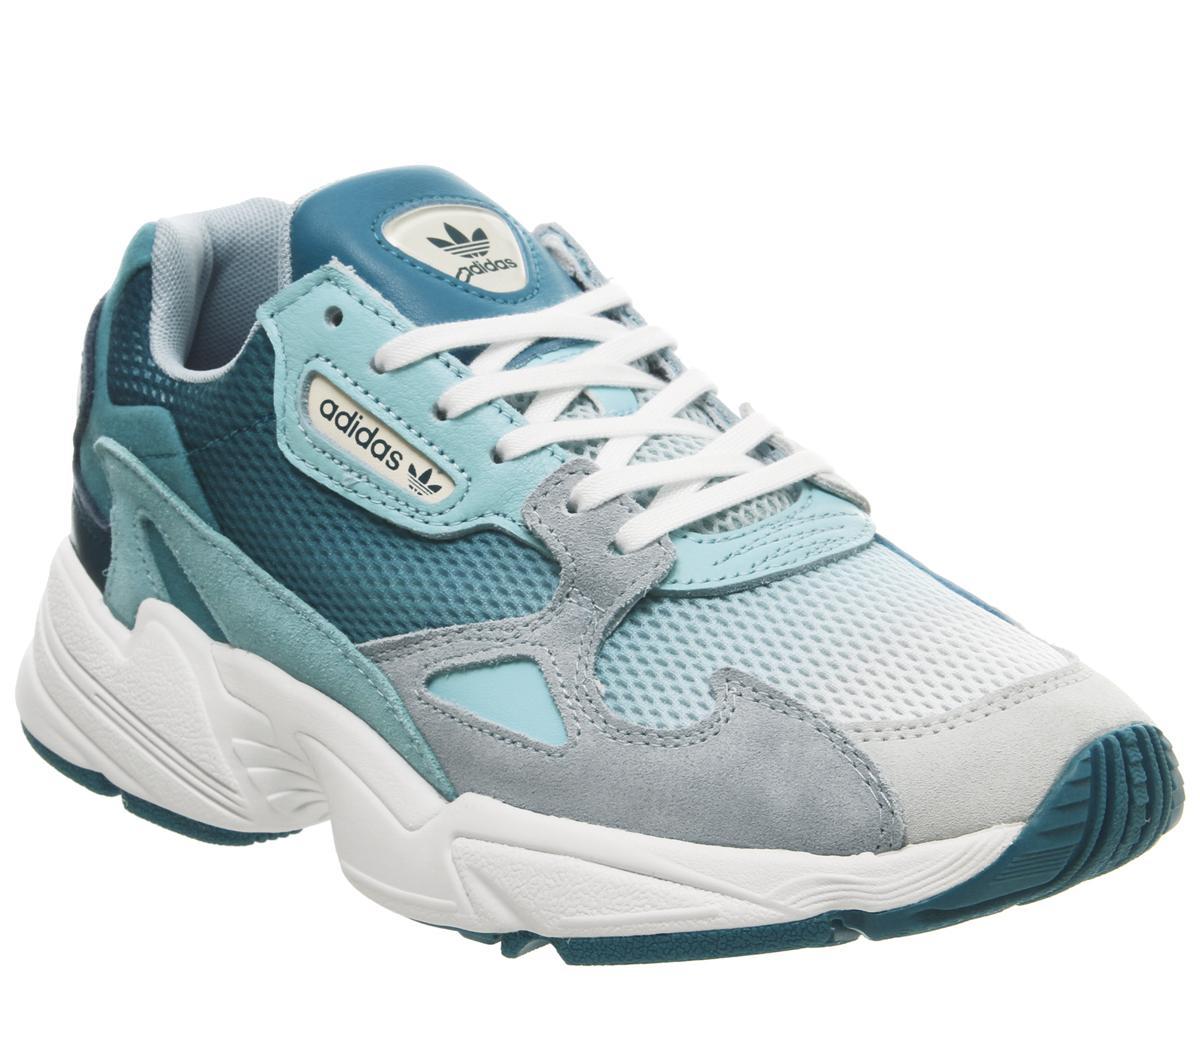 adidas Falcon Trainers Blue Tint Light